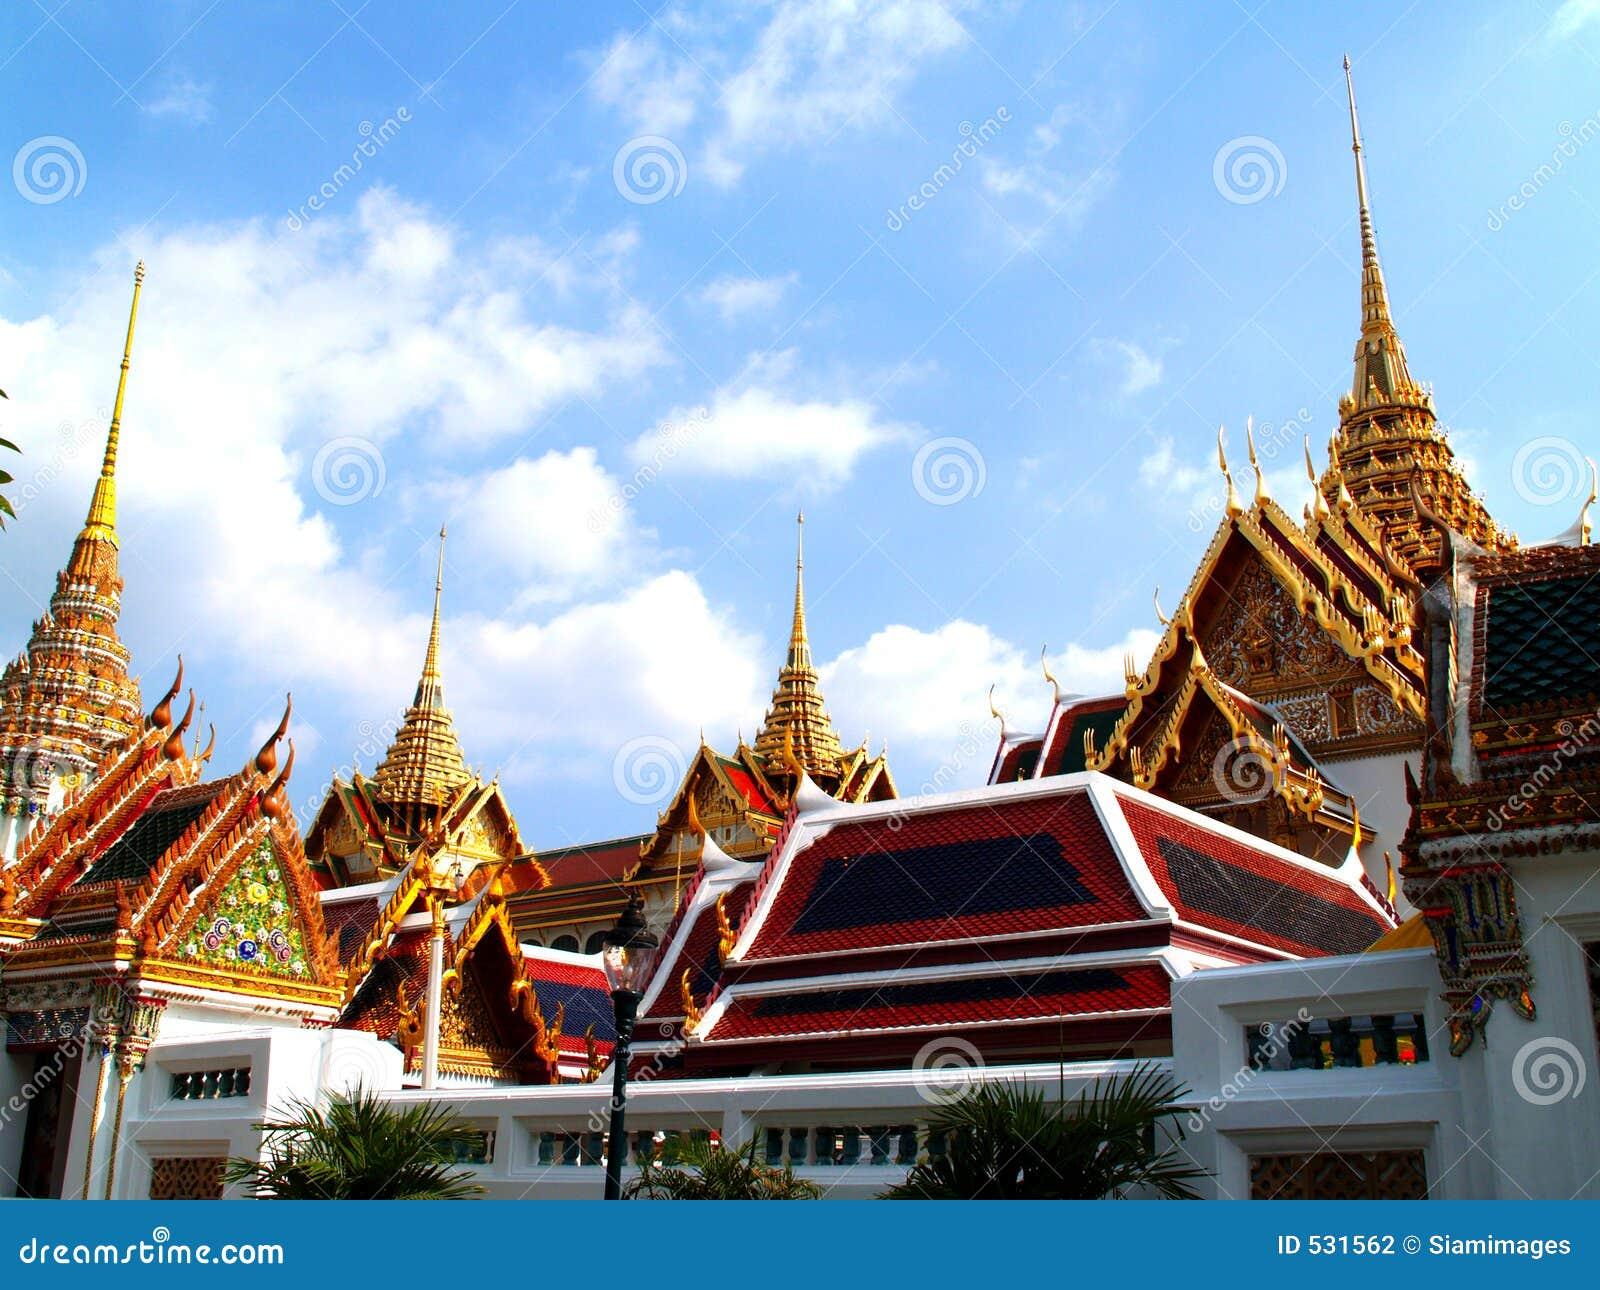 Thailand architecture stock photo image of thai grand for Thailand architecture